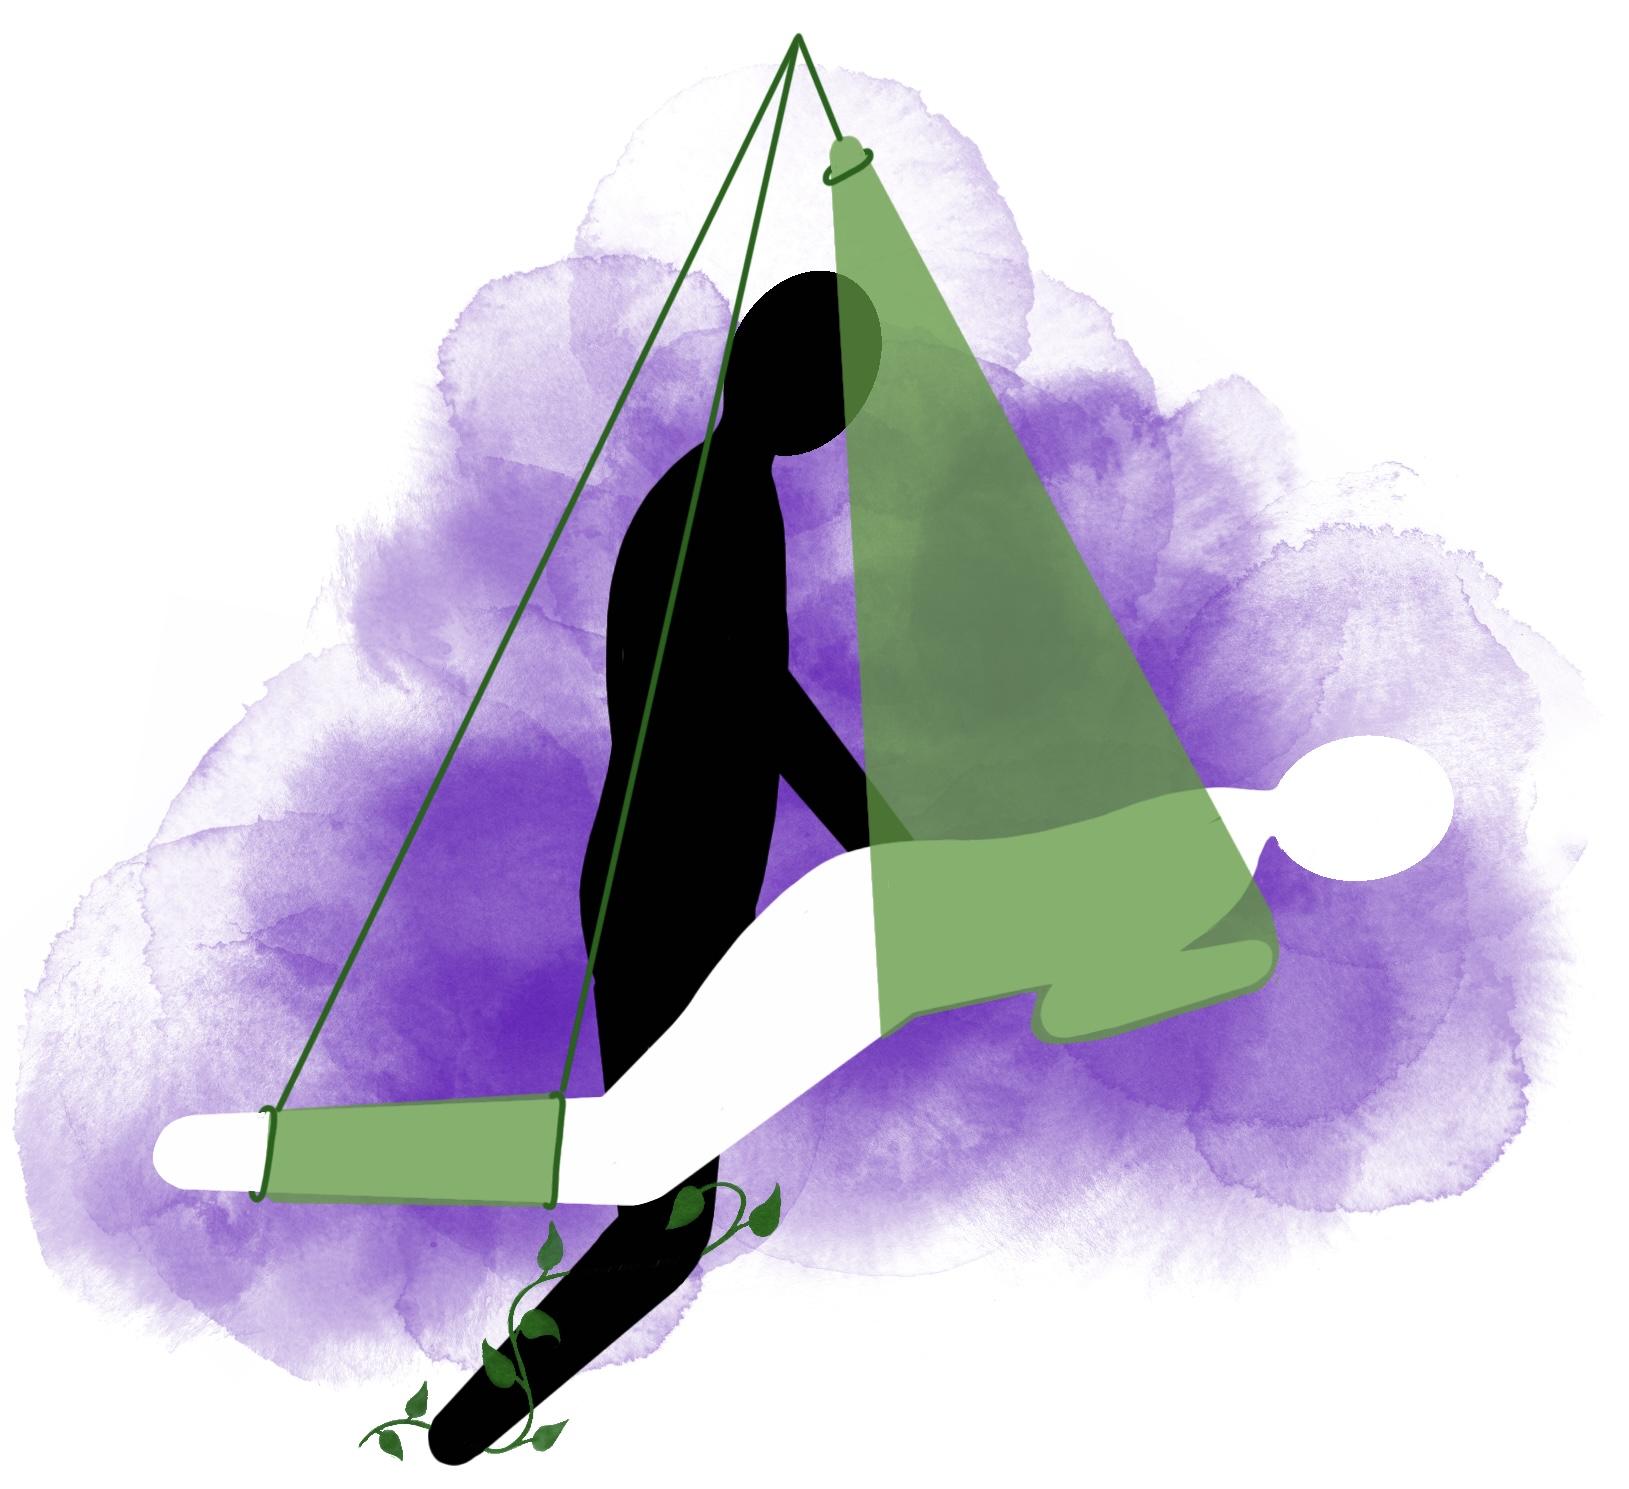 Stilling: Hun på magen med strake bein i en slynge